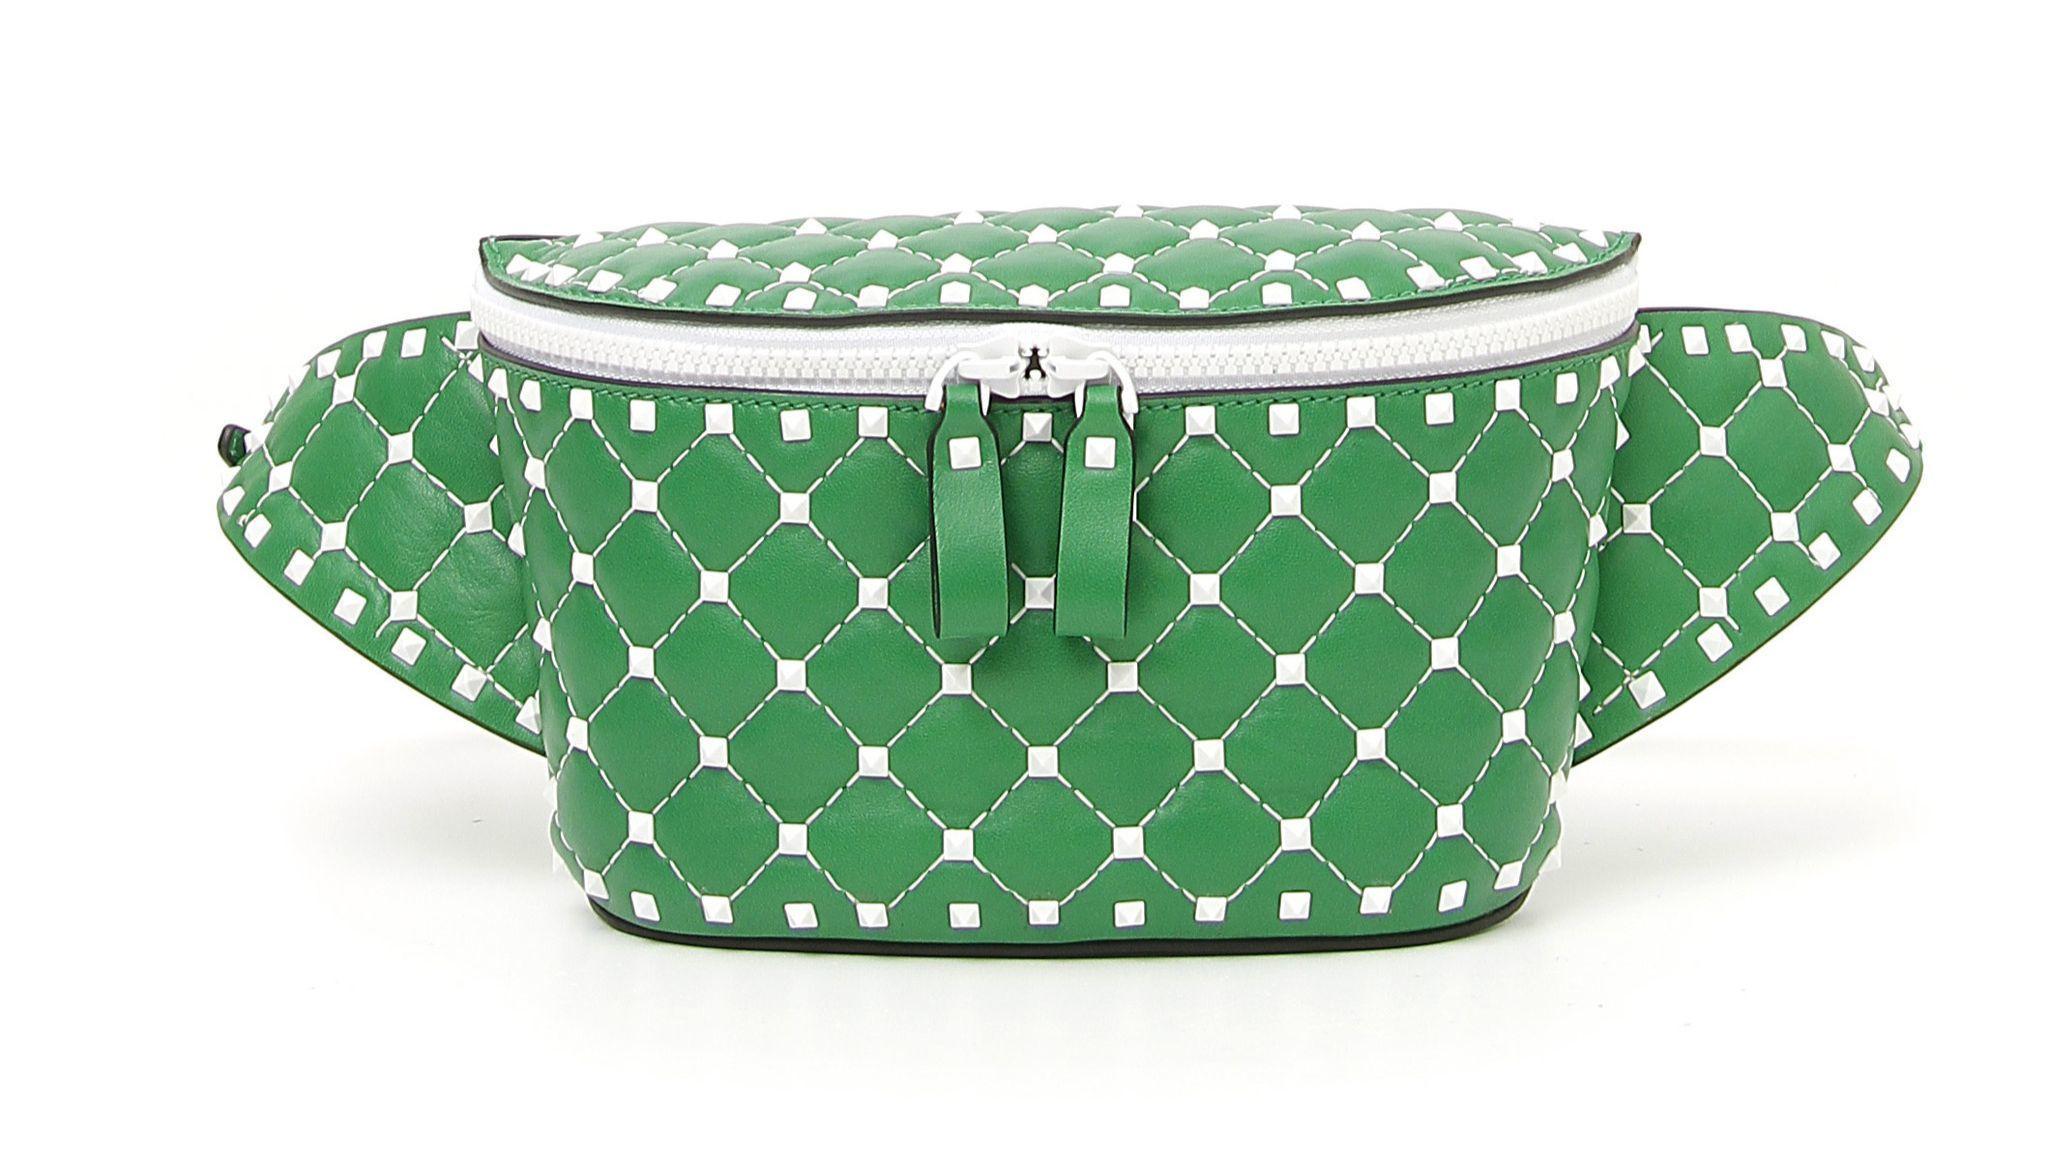 Valentino's Free Rockstud Spike Belt Bag.